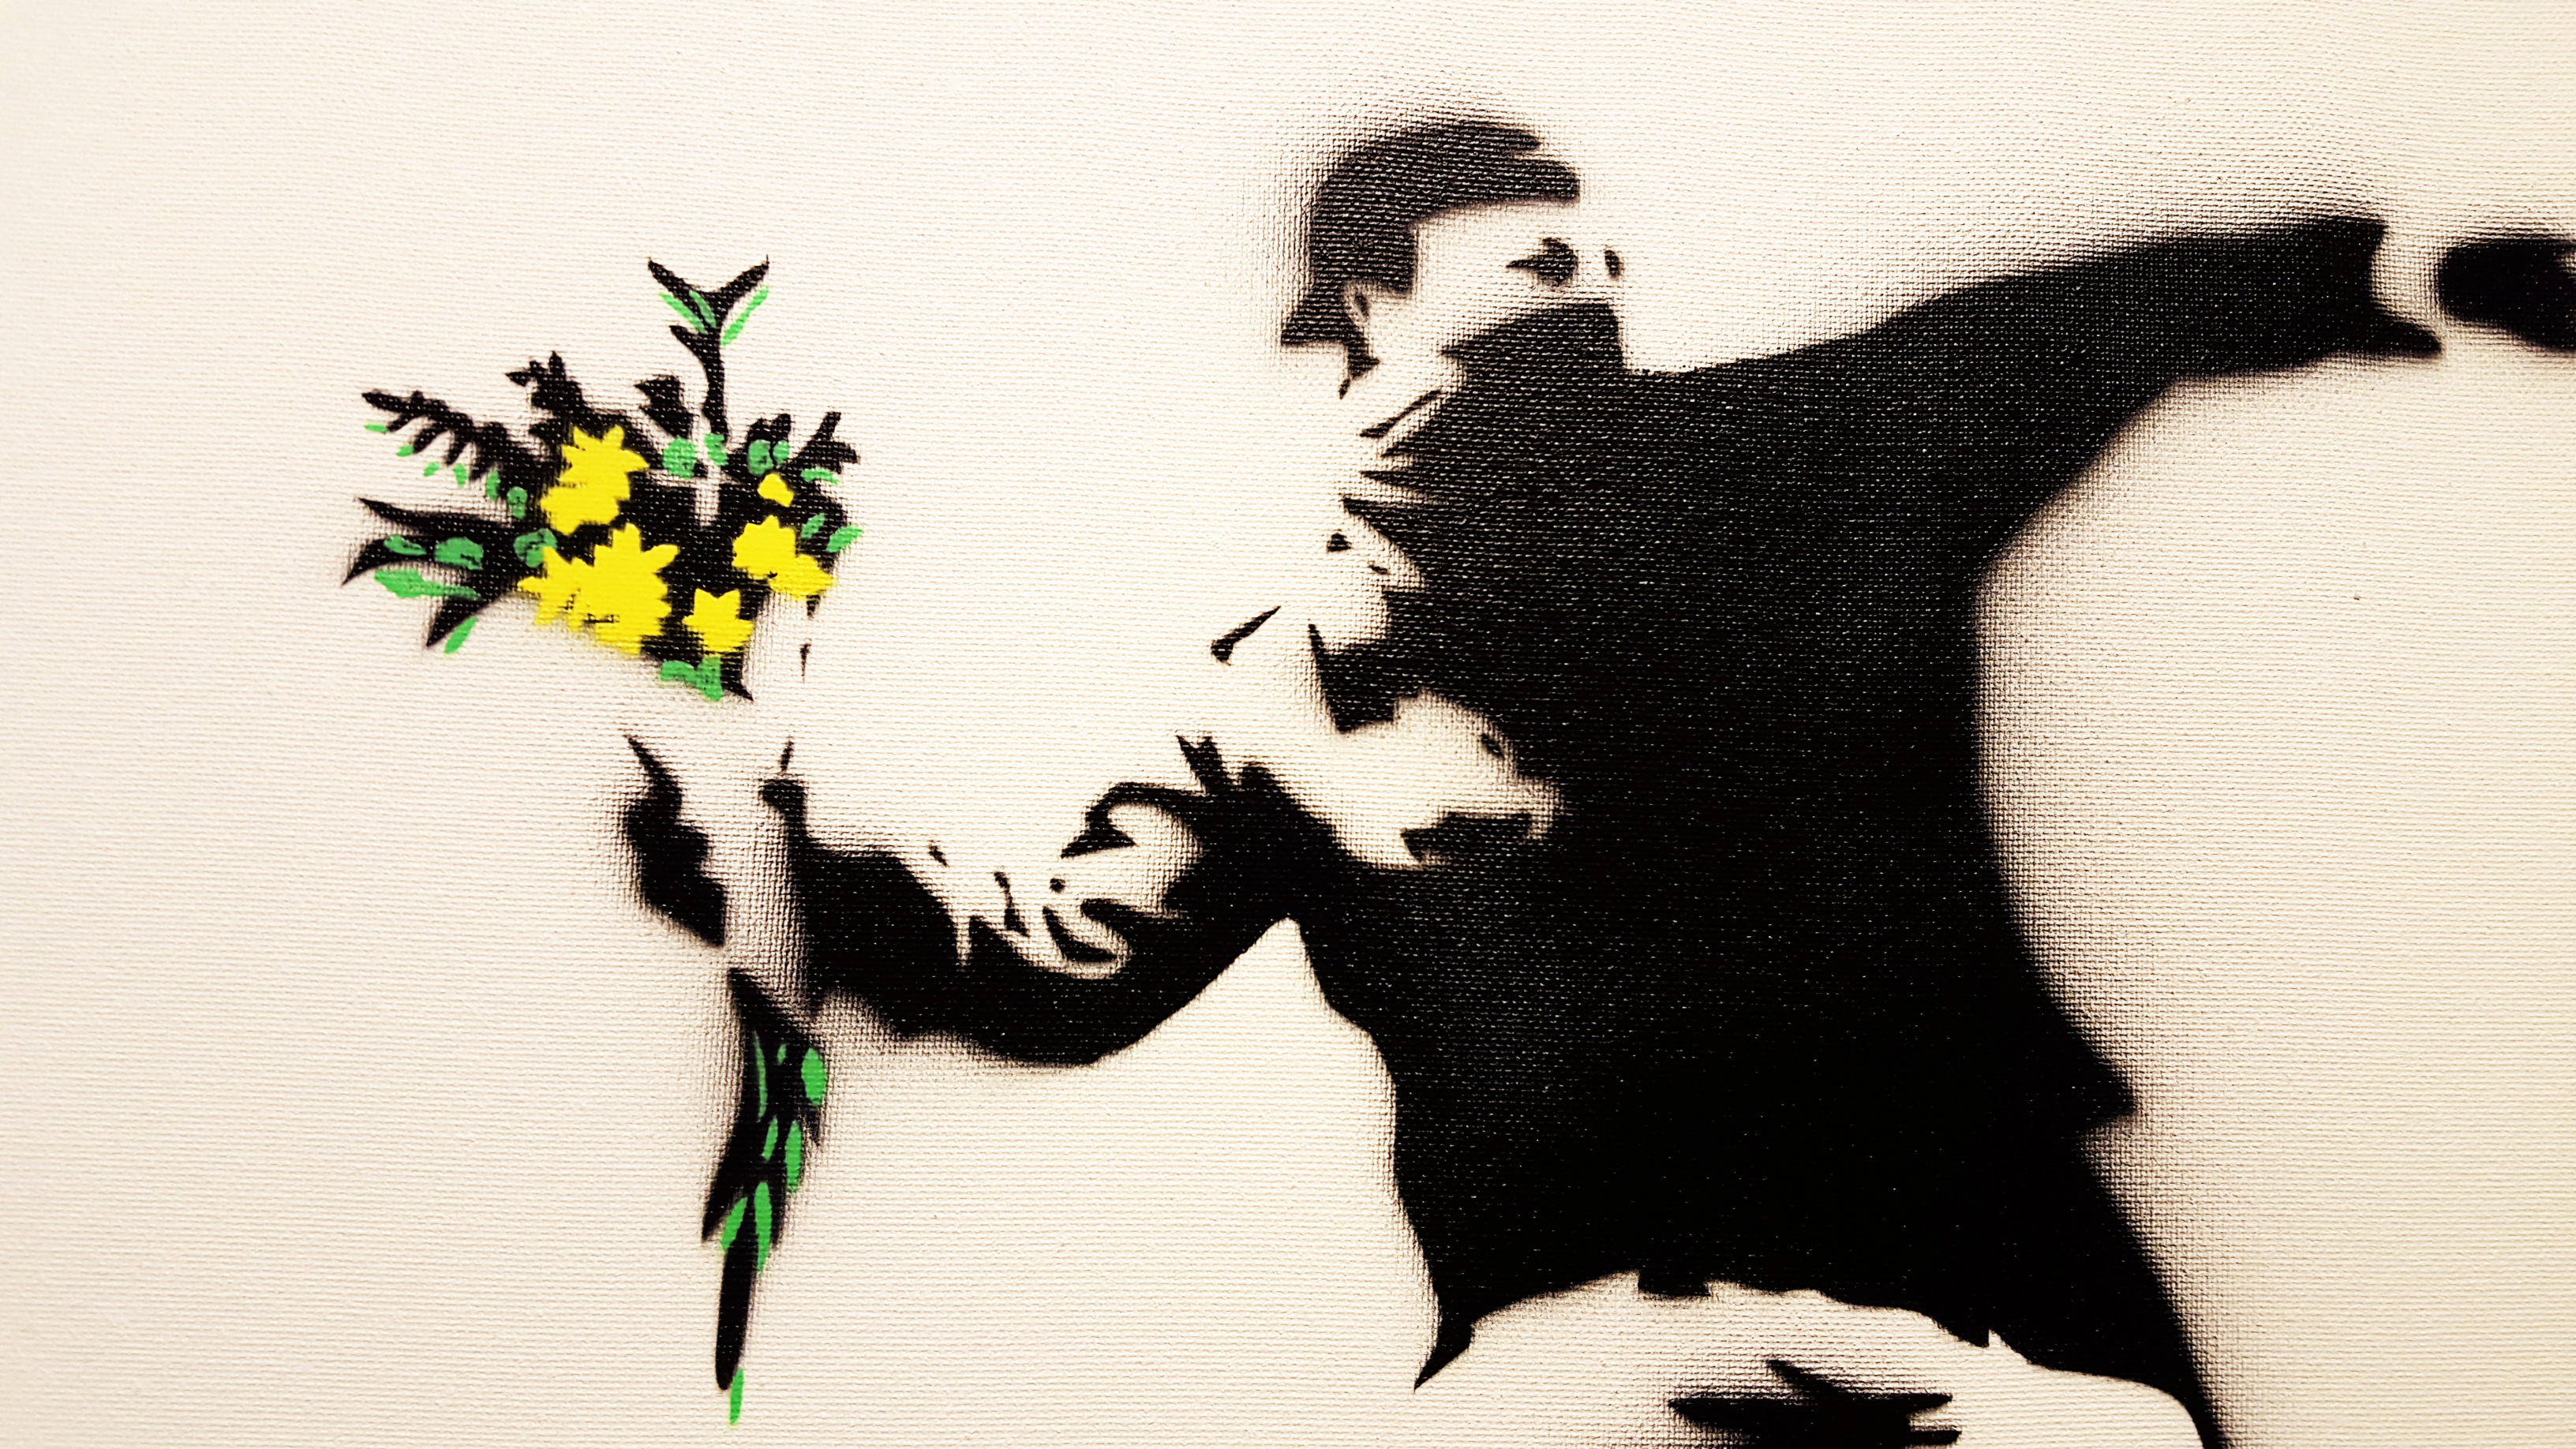 Danksy_Flowers_2